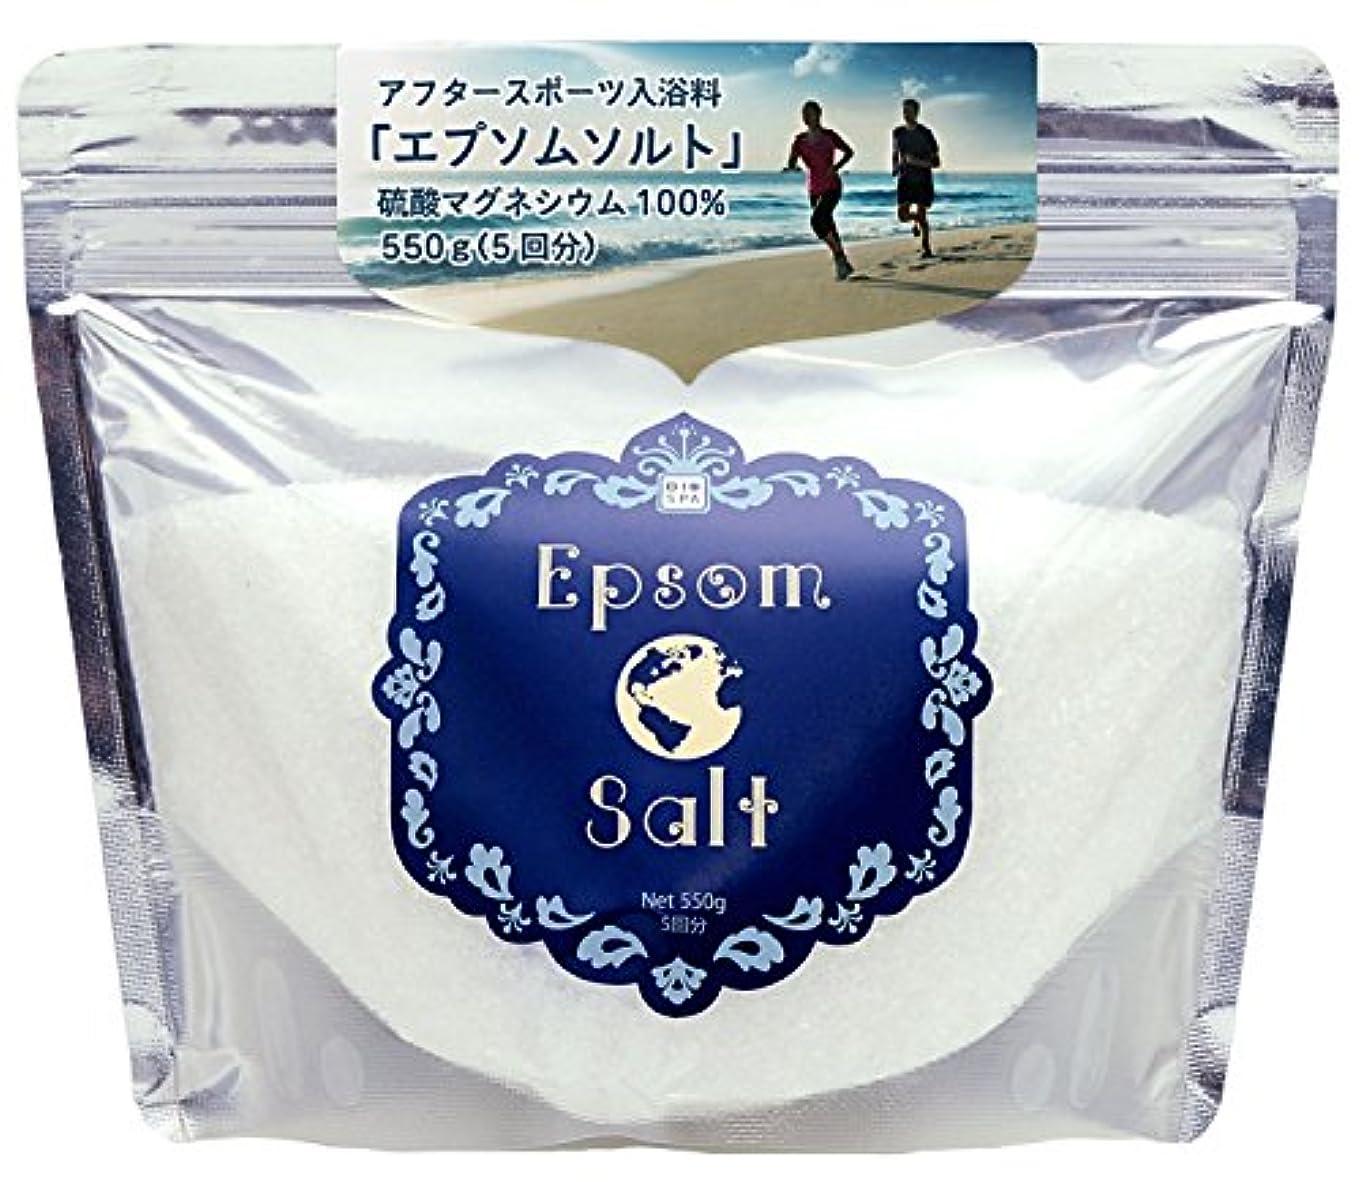 BIOSPA(ビオスパ) 入浴剤 エプソムソルト スポーツエディション 550g 約5回分 軽量スプーン付 EBS402